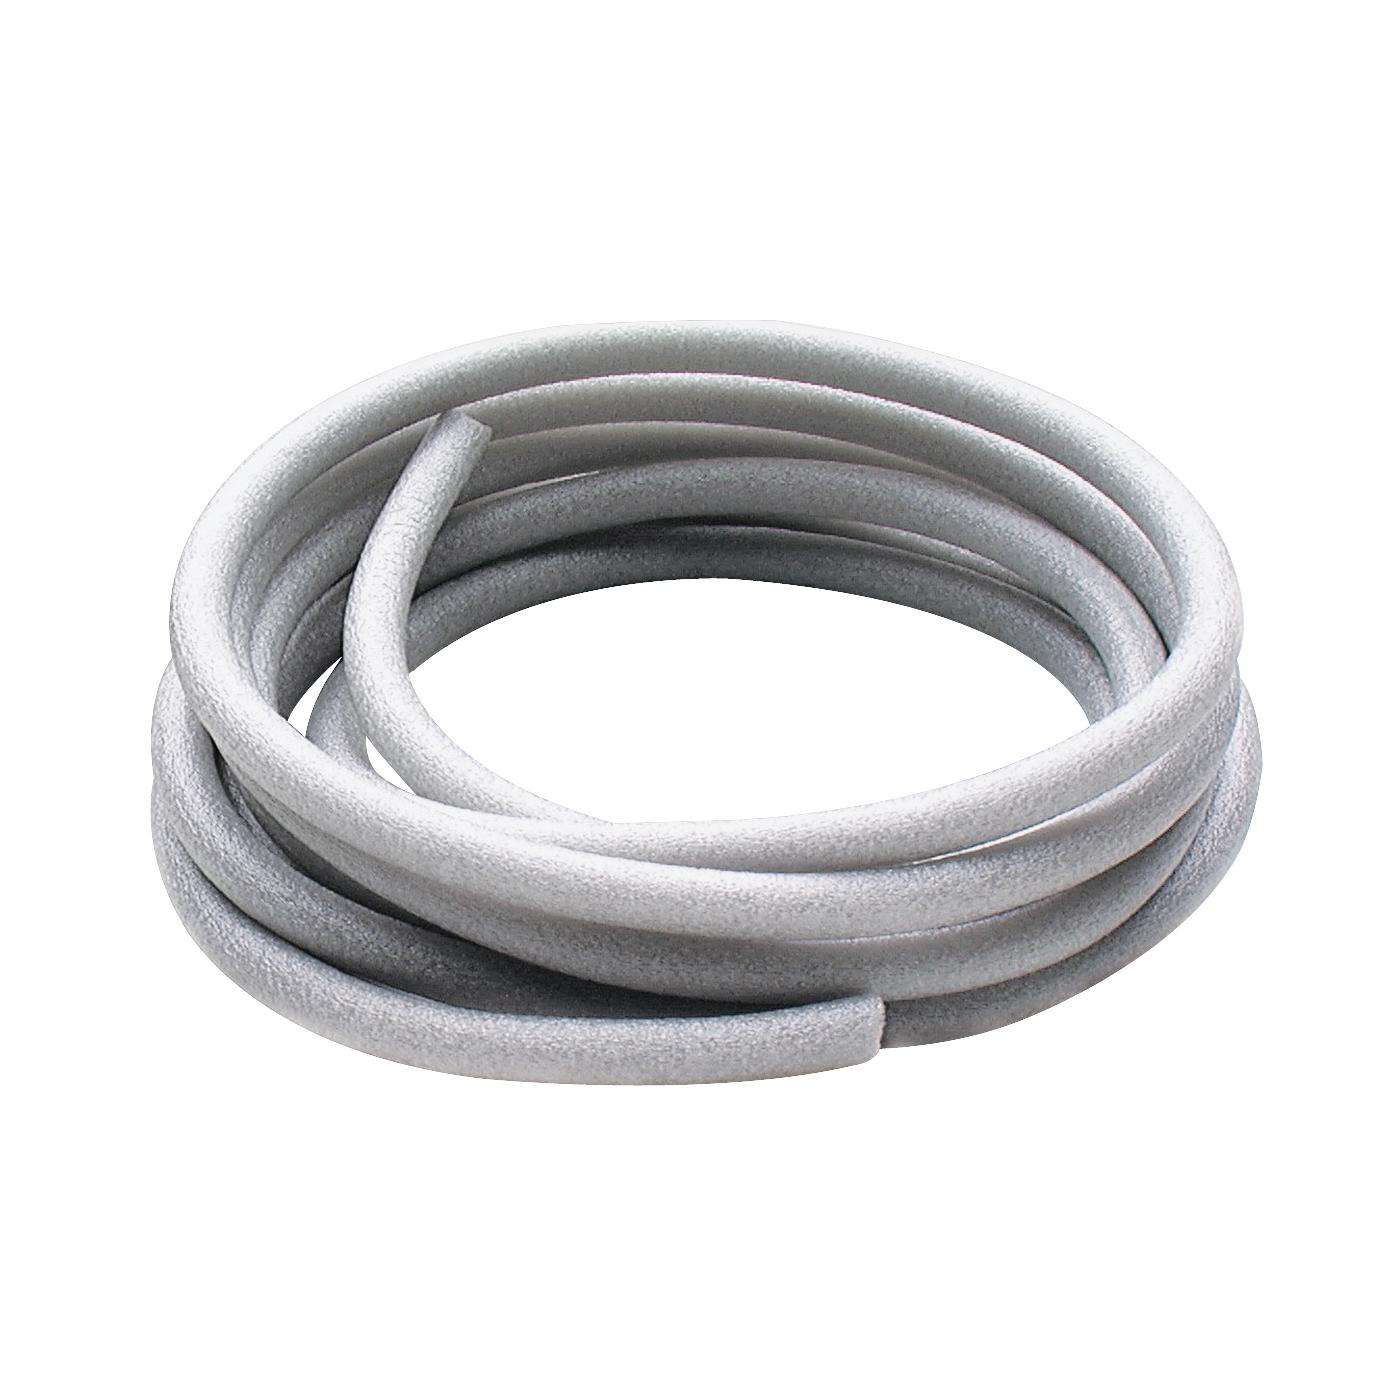 Picture of M-D 71506 Backer Rod, 5/8 in Dia, 20 ft L, Polyethylene, Gray